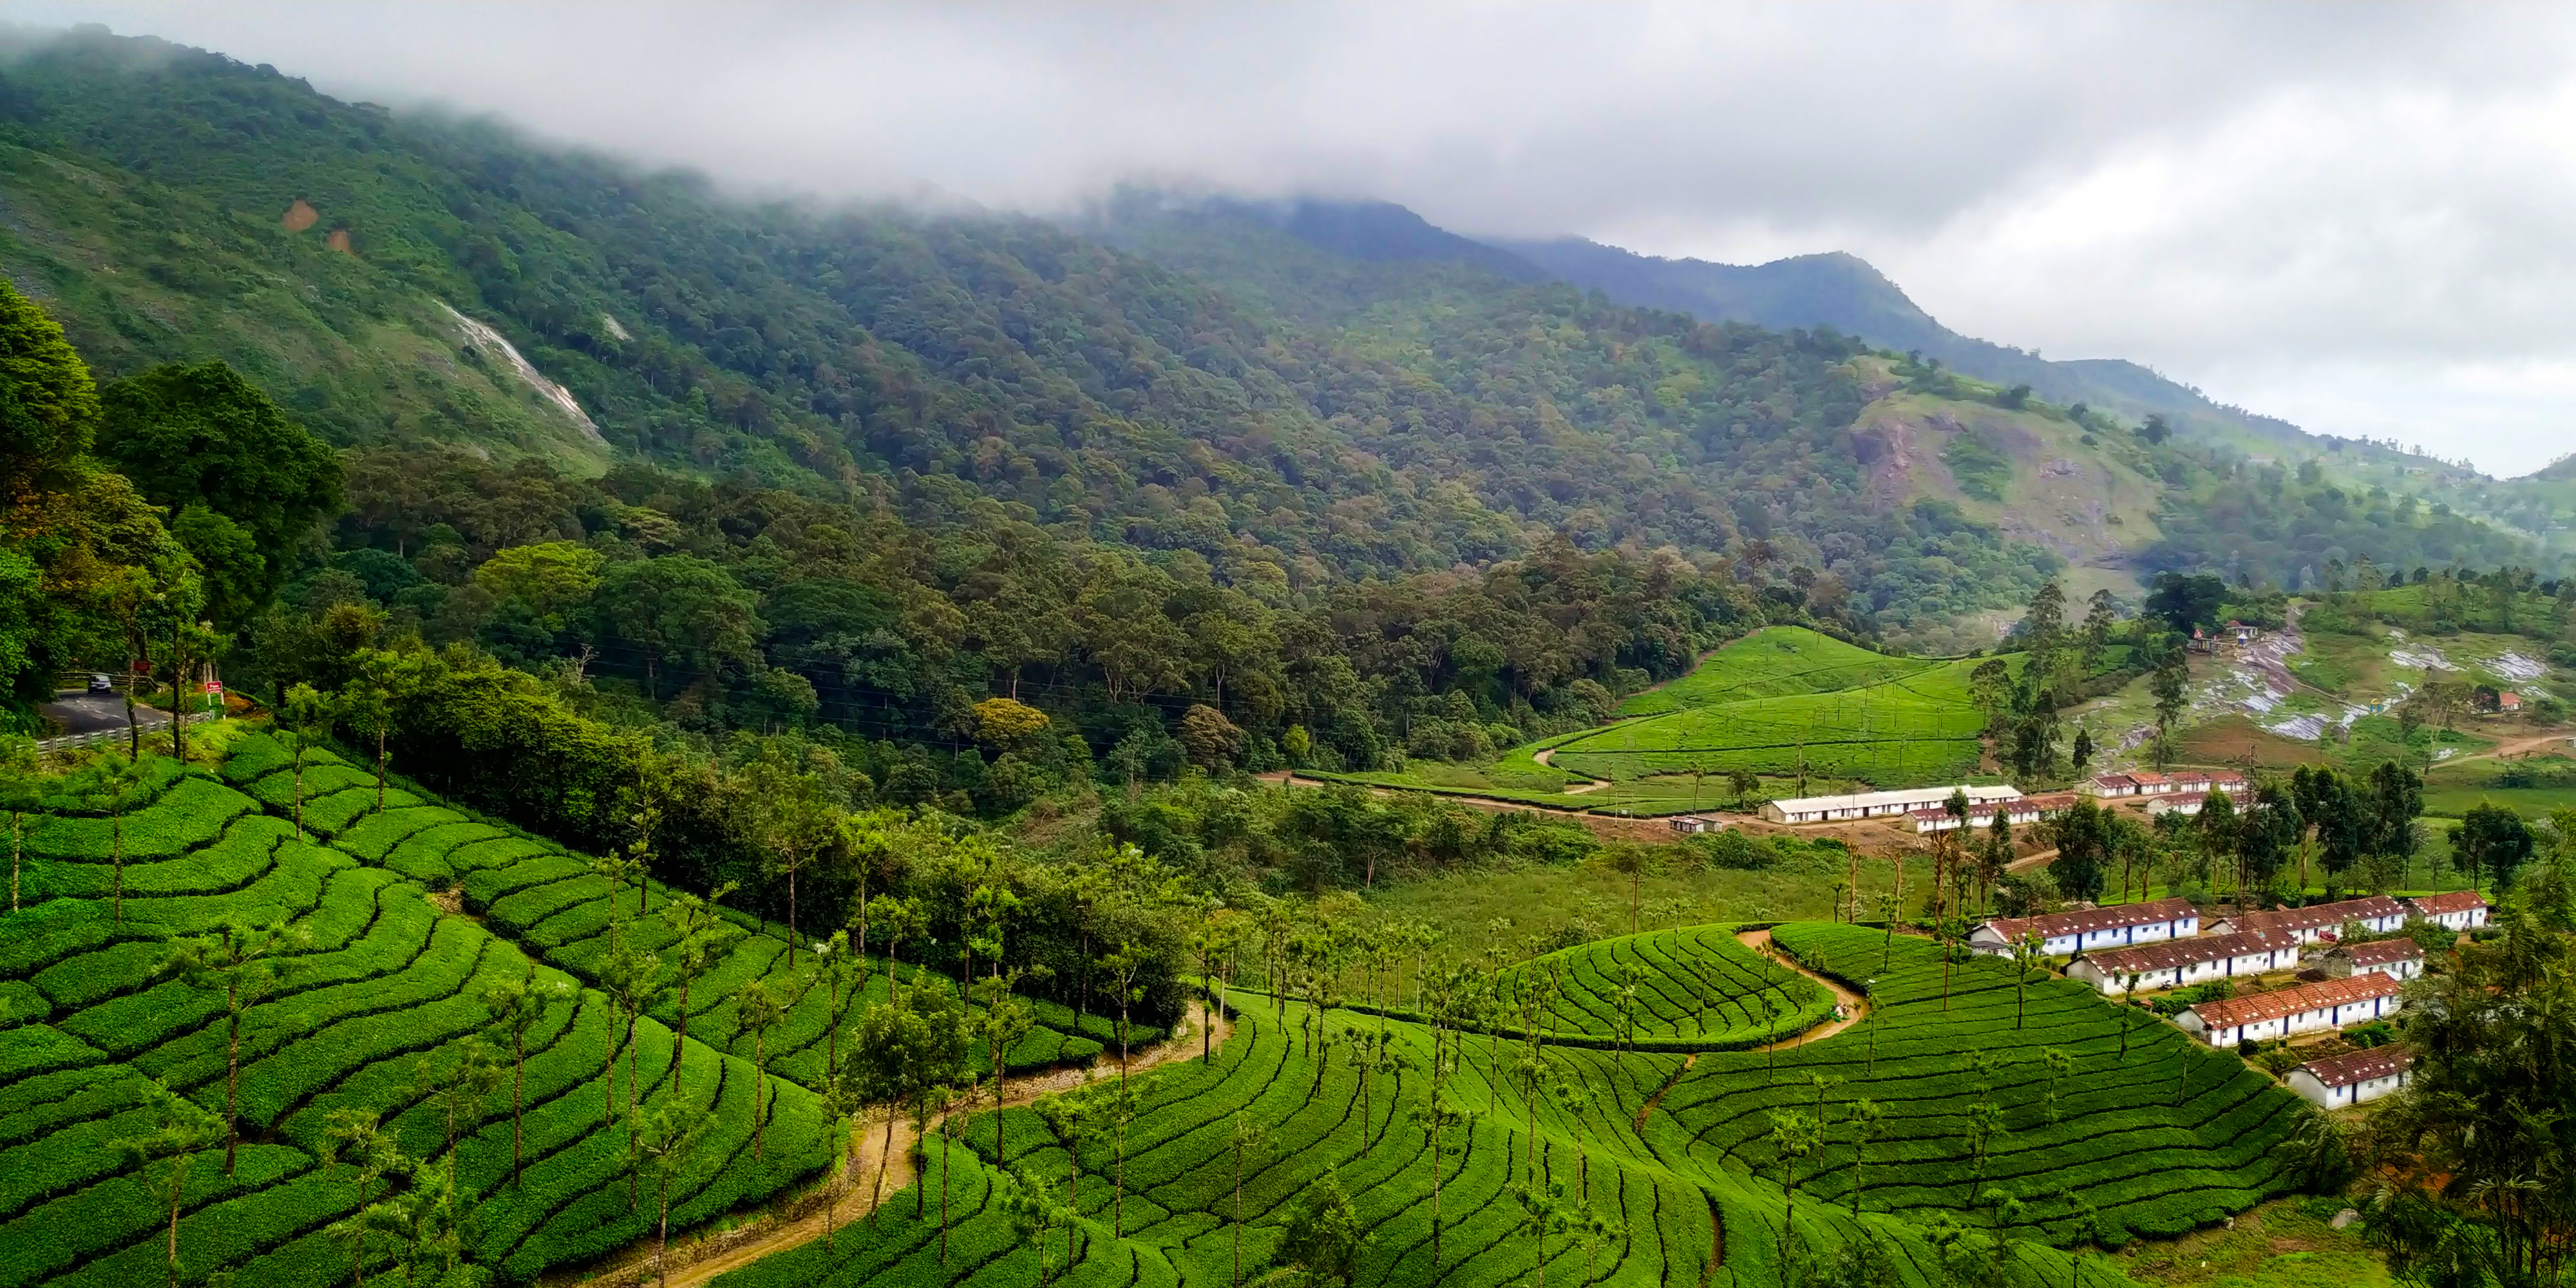 valparai shola and tea plantations - www.happybotanist.com